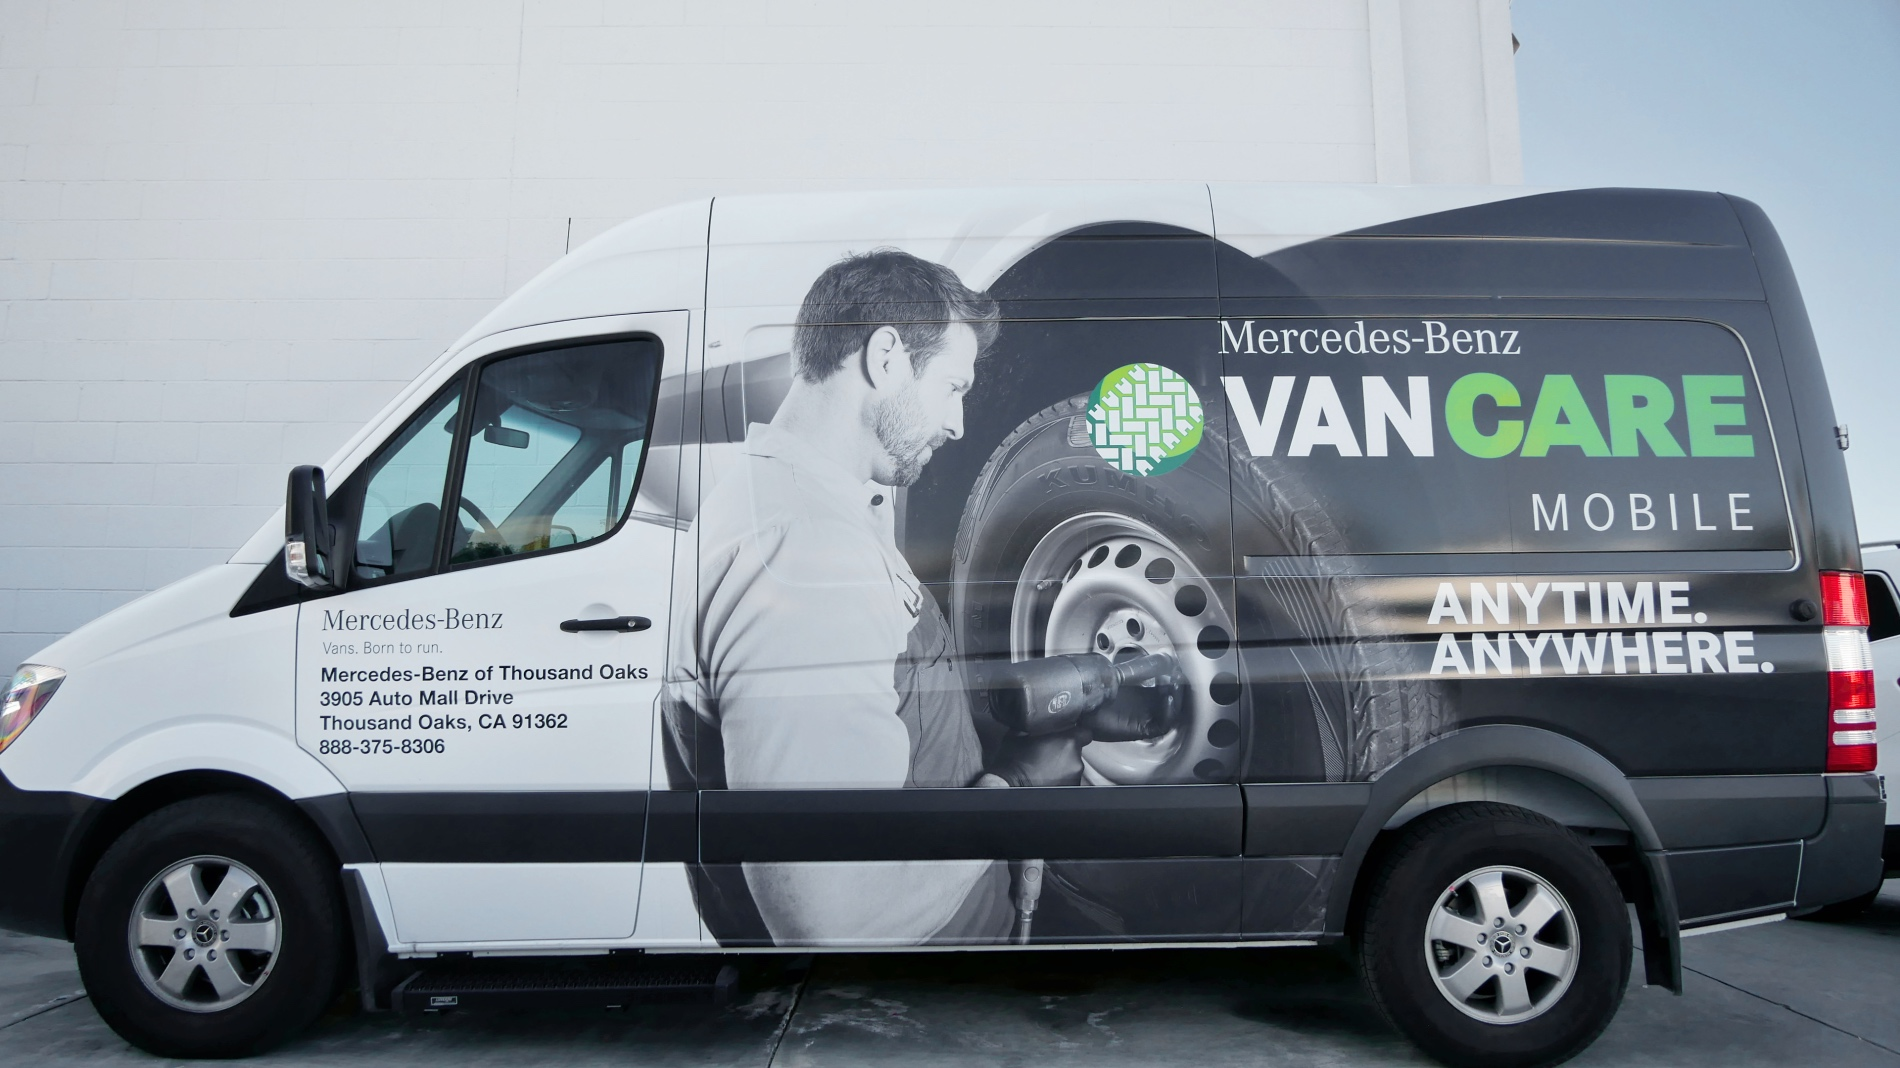 Mercedes Mobile Service Van